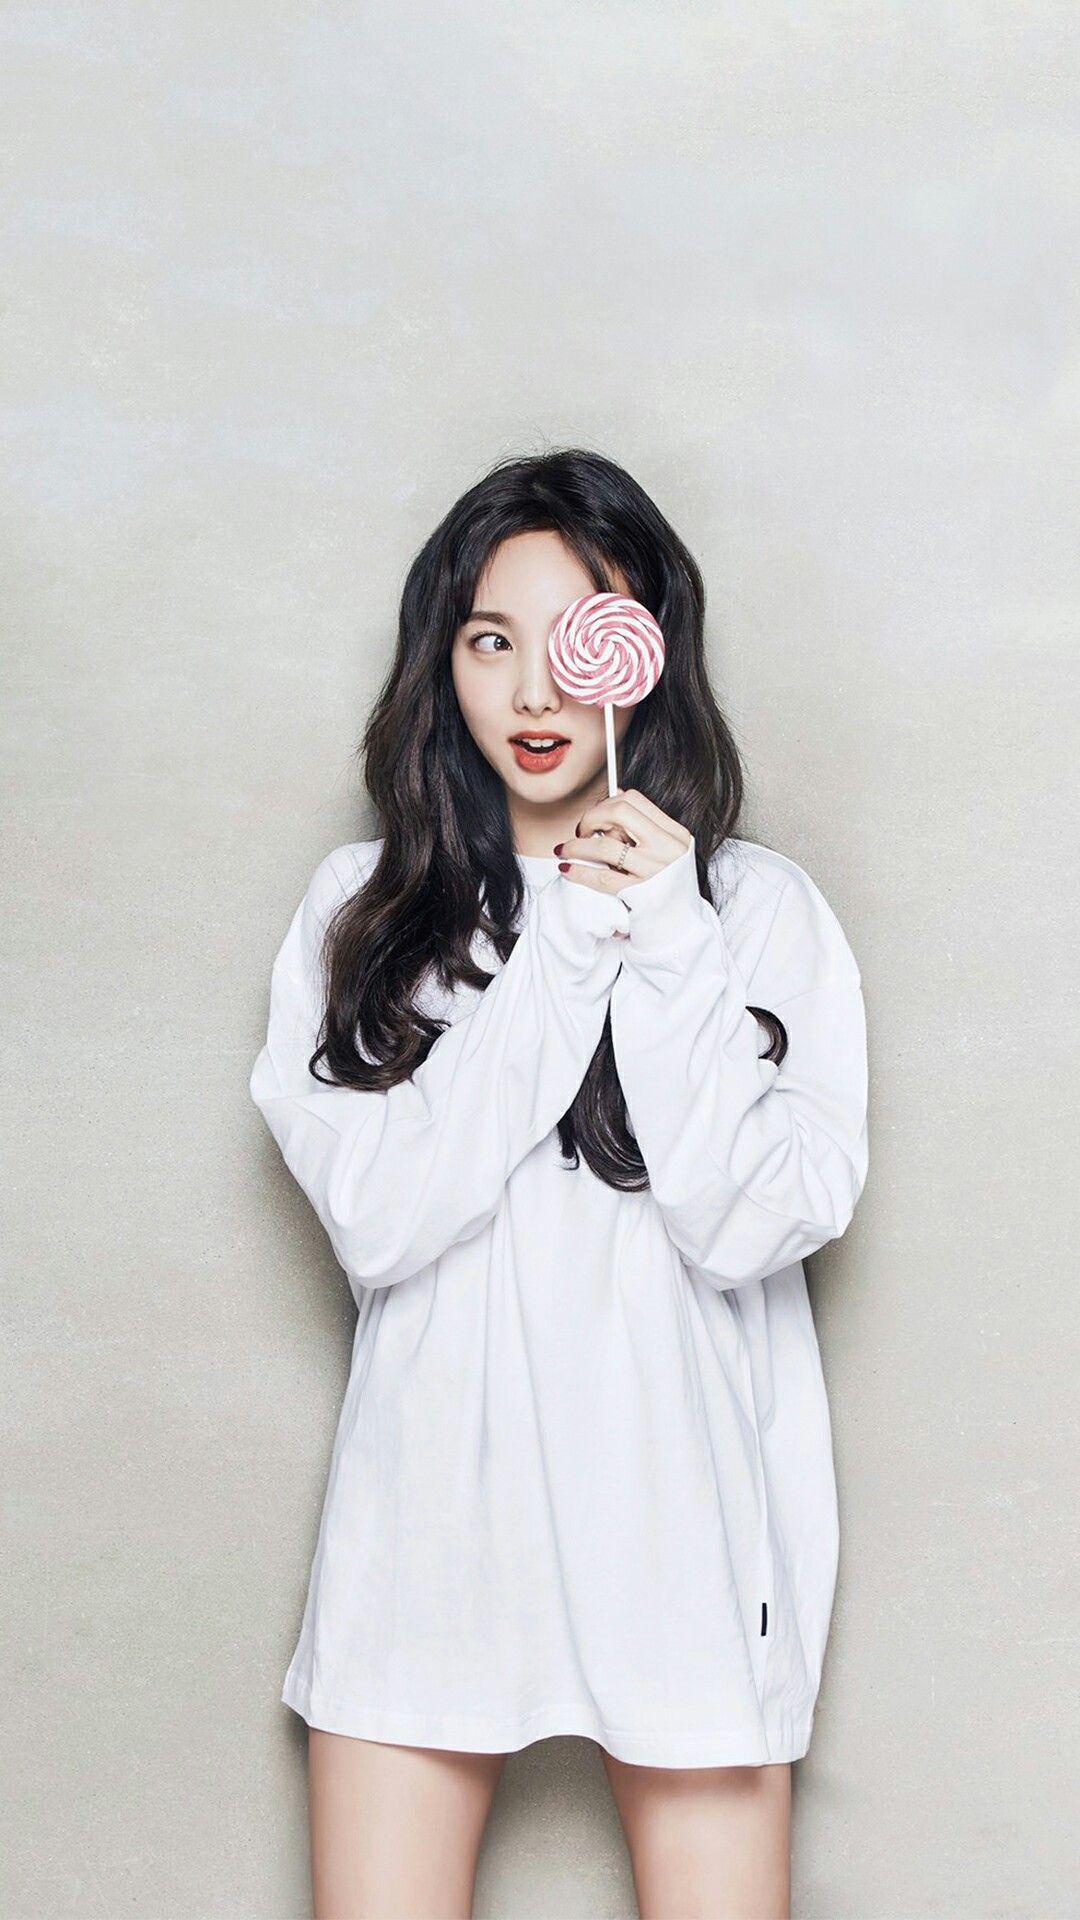 Free Download Twice X Ohboy 2018 Kpop Wallpaper Lockscreen